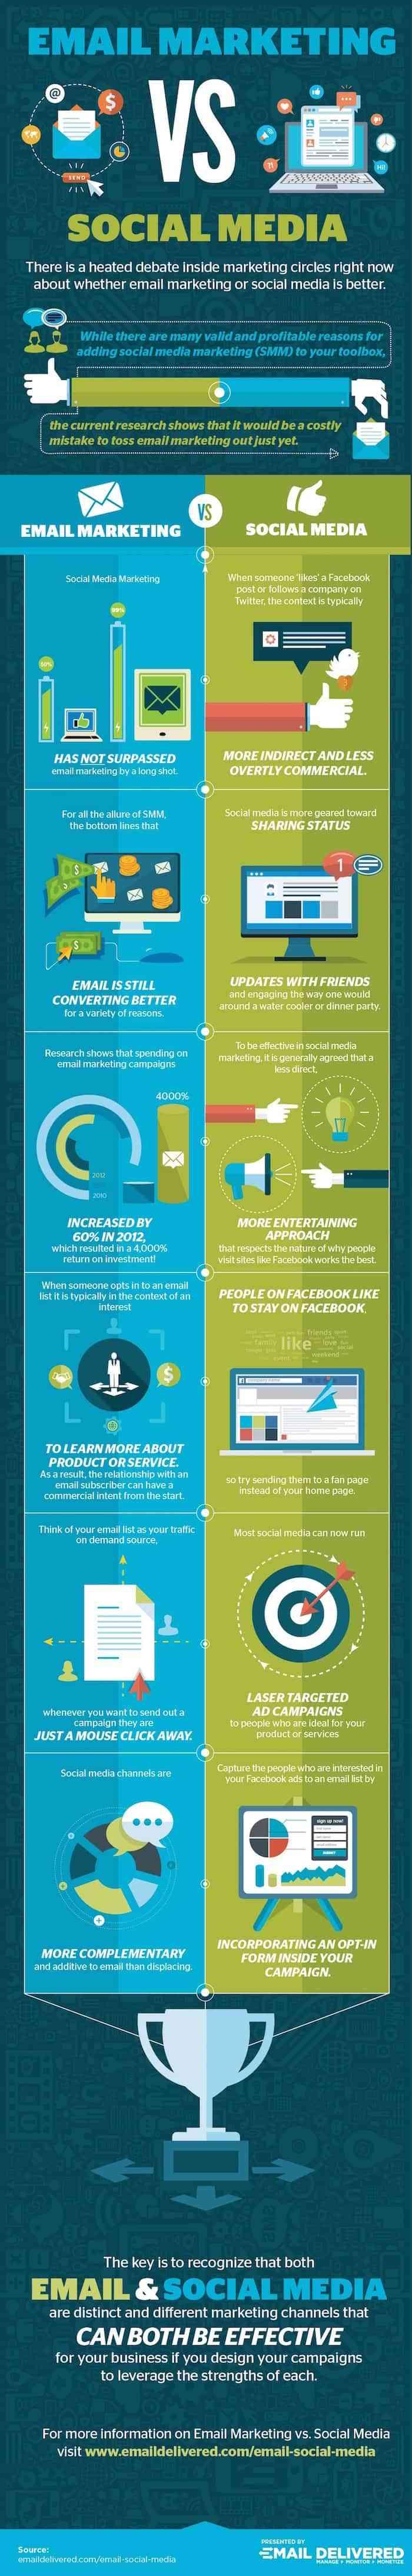 email-vs-social